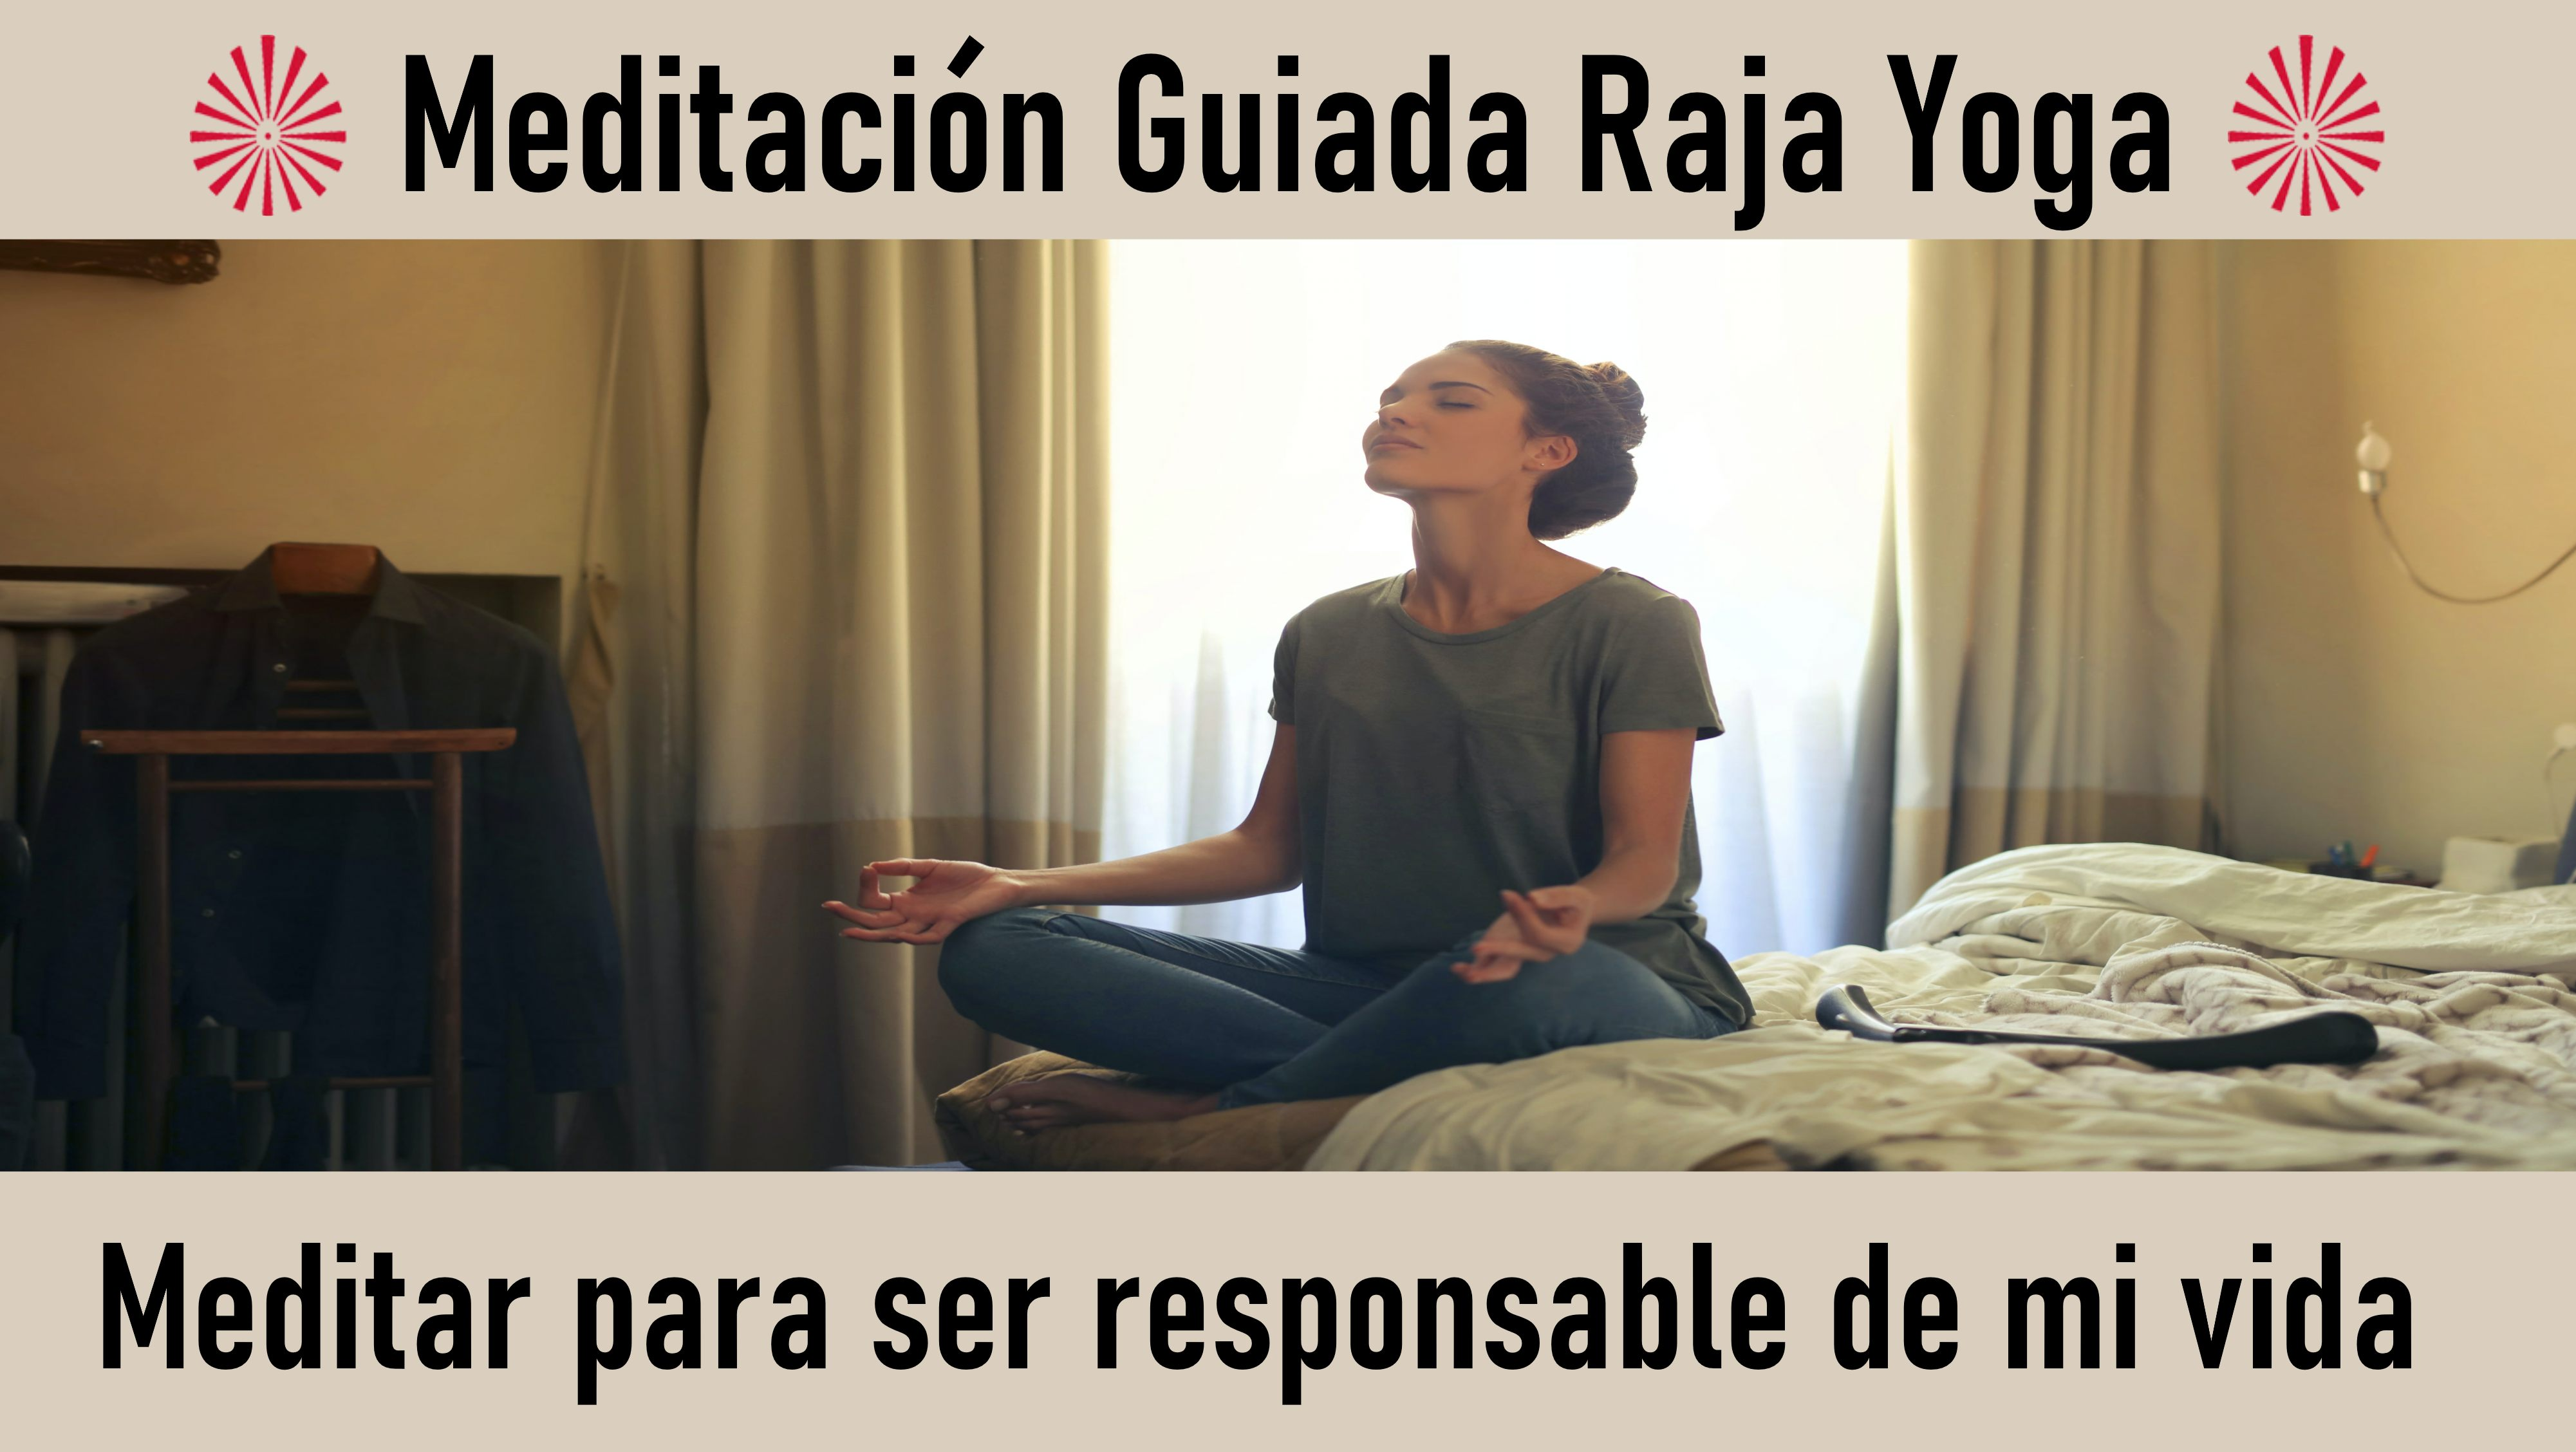 Meditación Raja Yoga: Meditar para ser responsable de mi vida (9 Septiembre 2020)